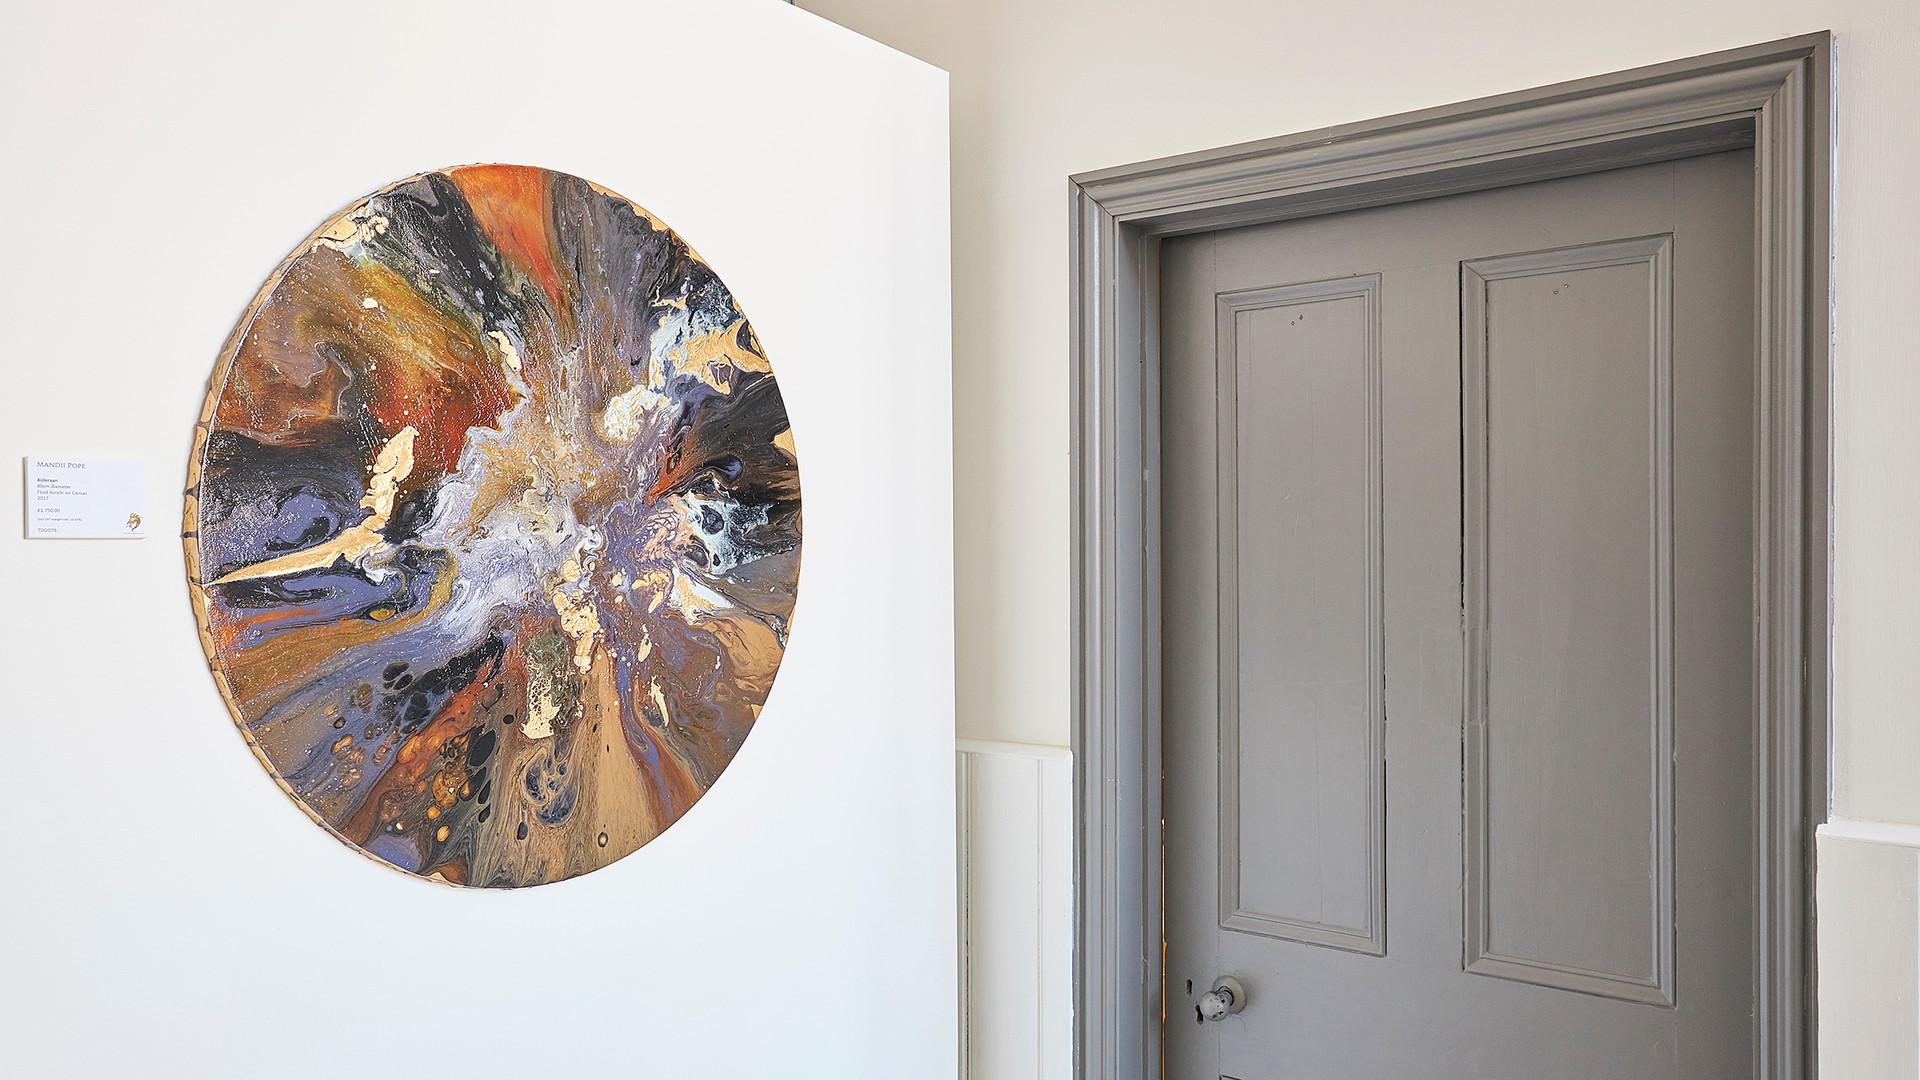 The Dragon Gallery Spring Exhibition